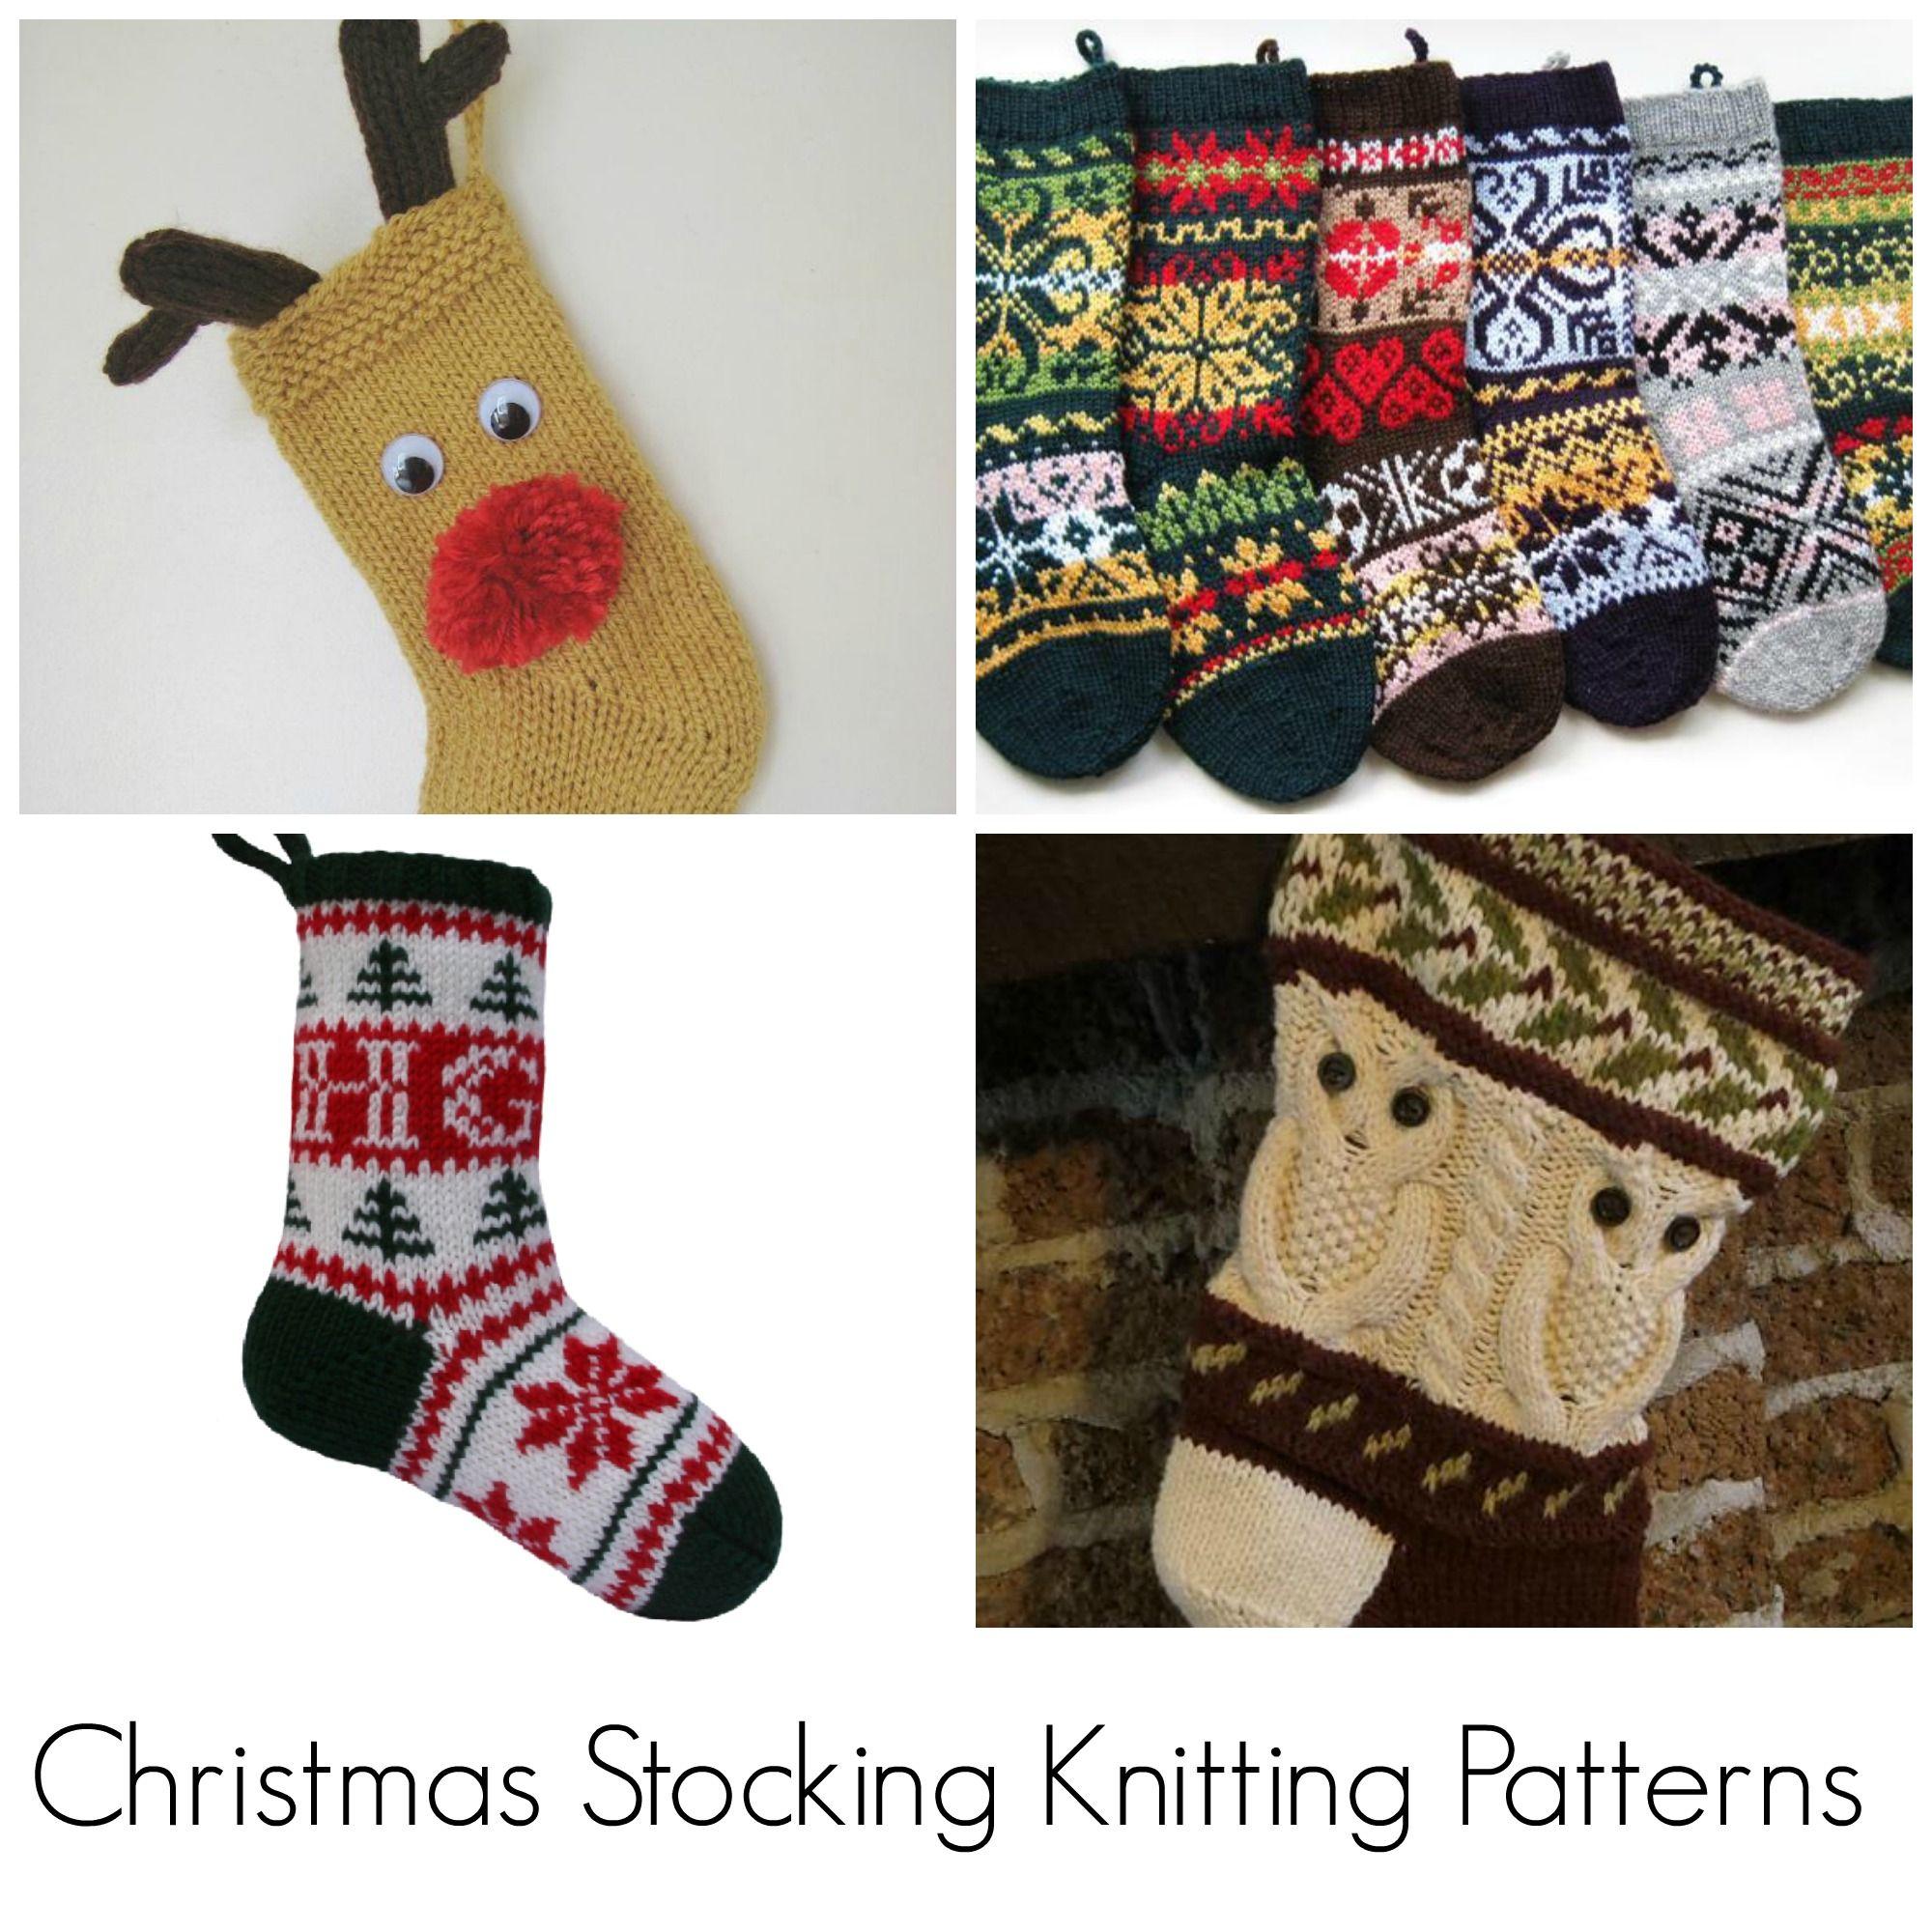 Top Christmas Stocking Knitting Pattern Picks | Knit patterns ...